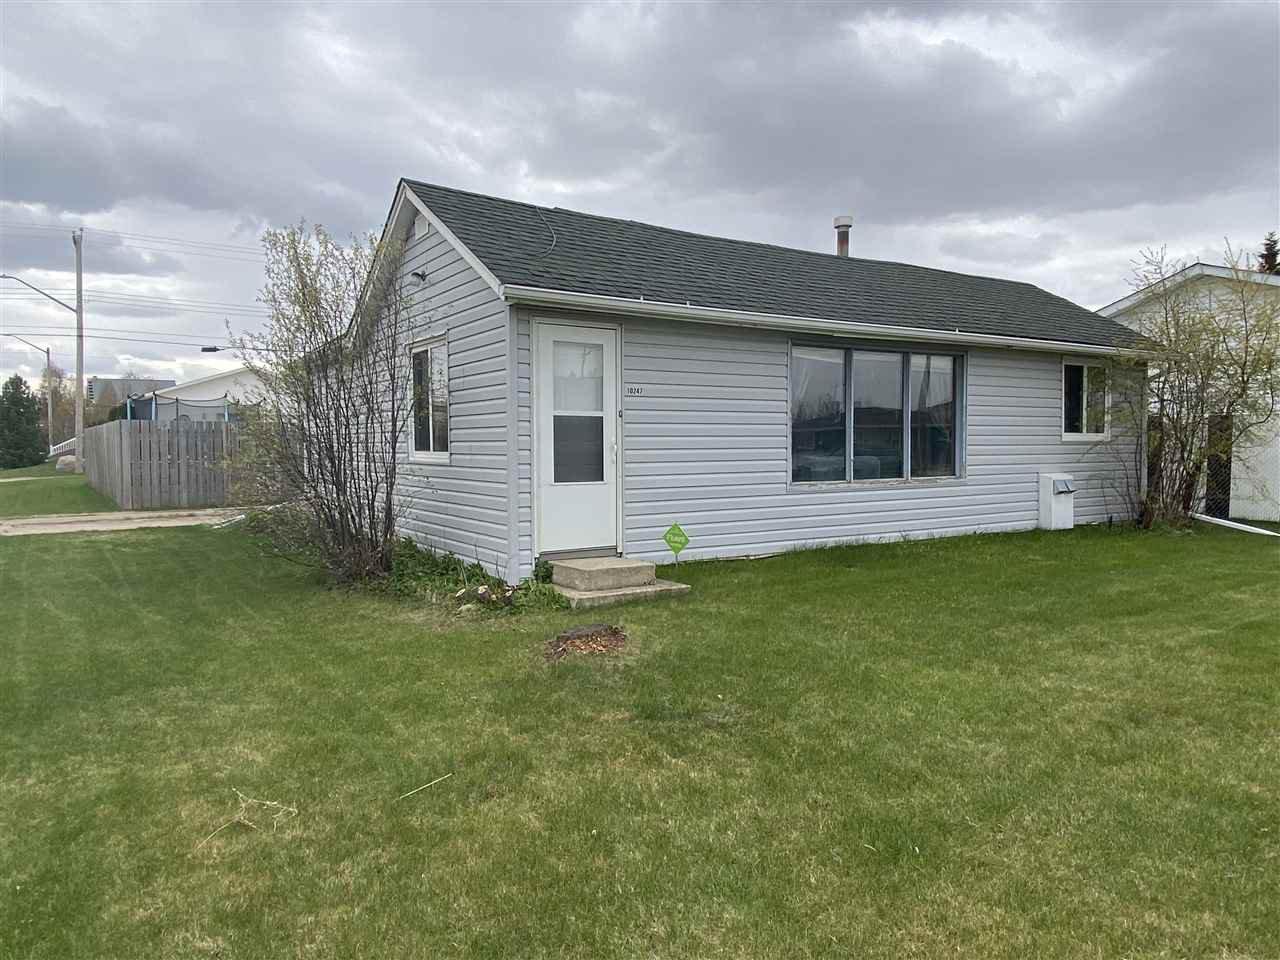 Main Photo: 10247 107 Street: Westlock House for sale : MLS®# E4197632